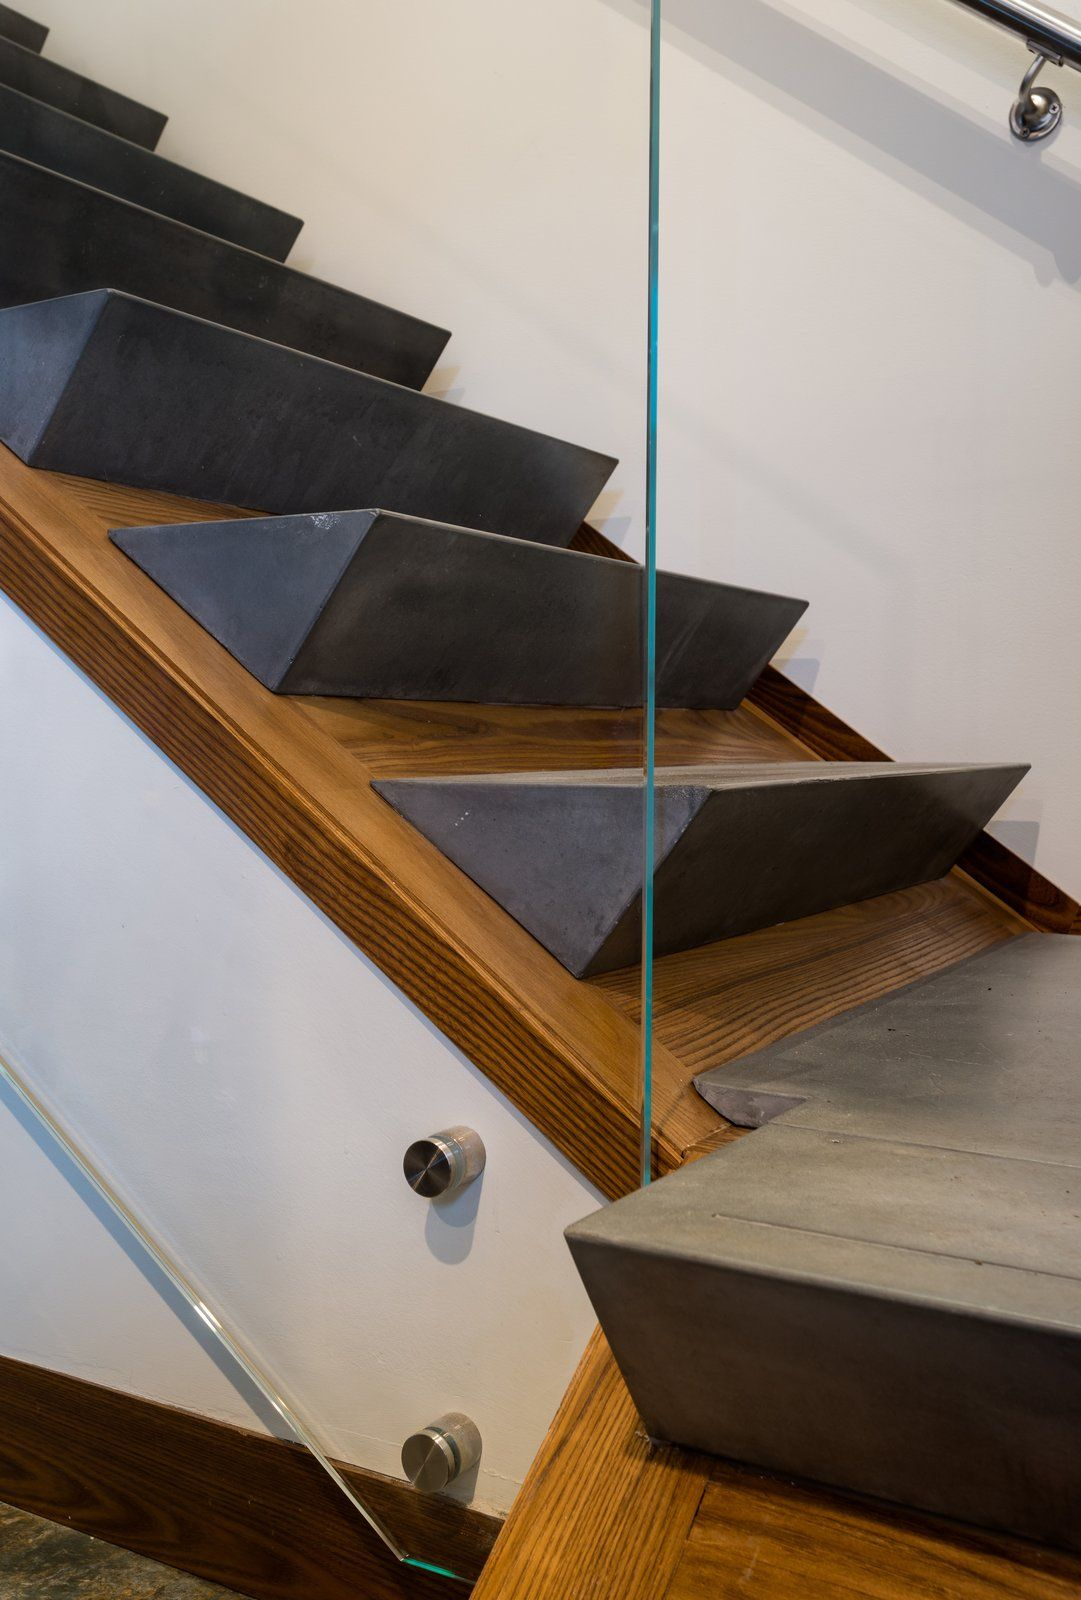 taphouse by grid treppe stiegen und estrich. Black Bedroom Furniture Sets. Home Design Ideas